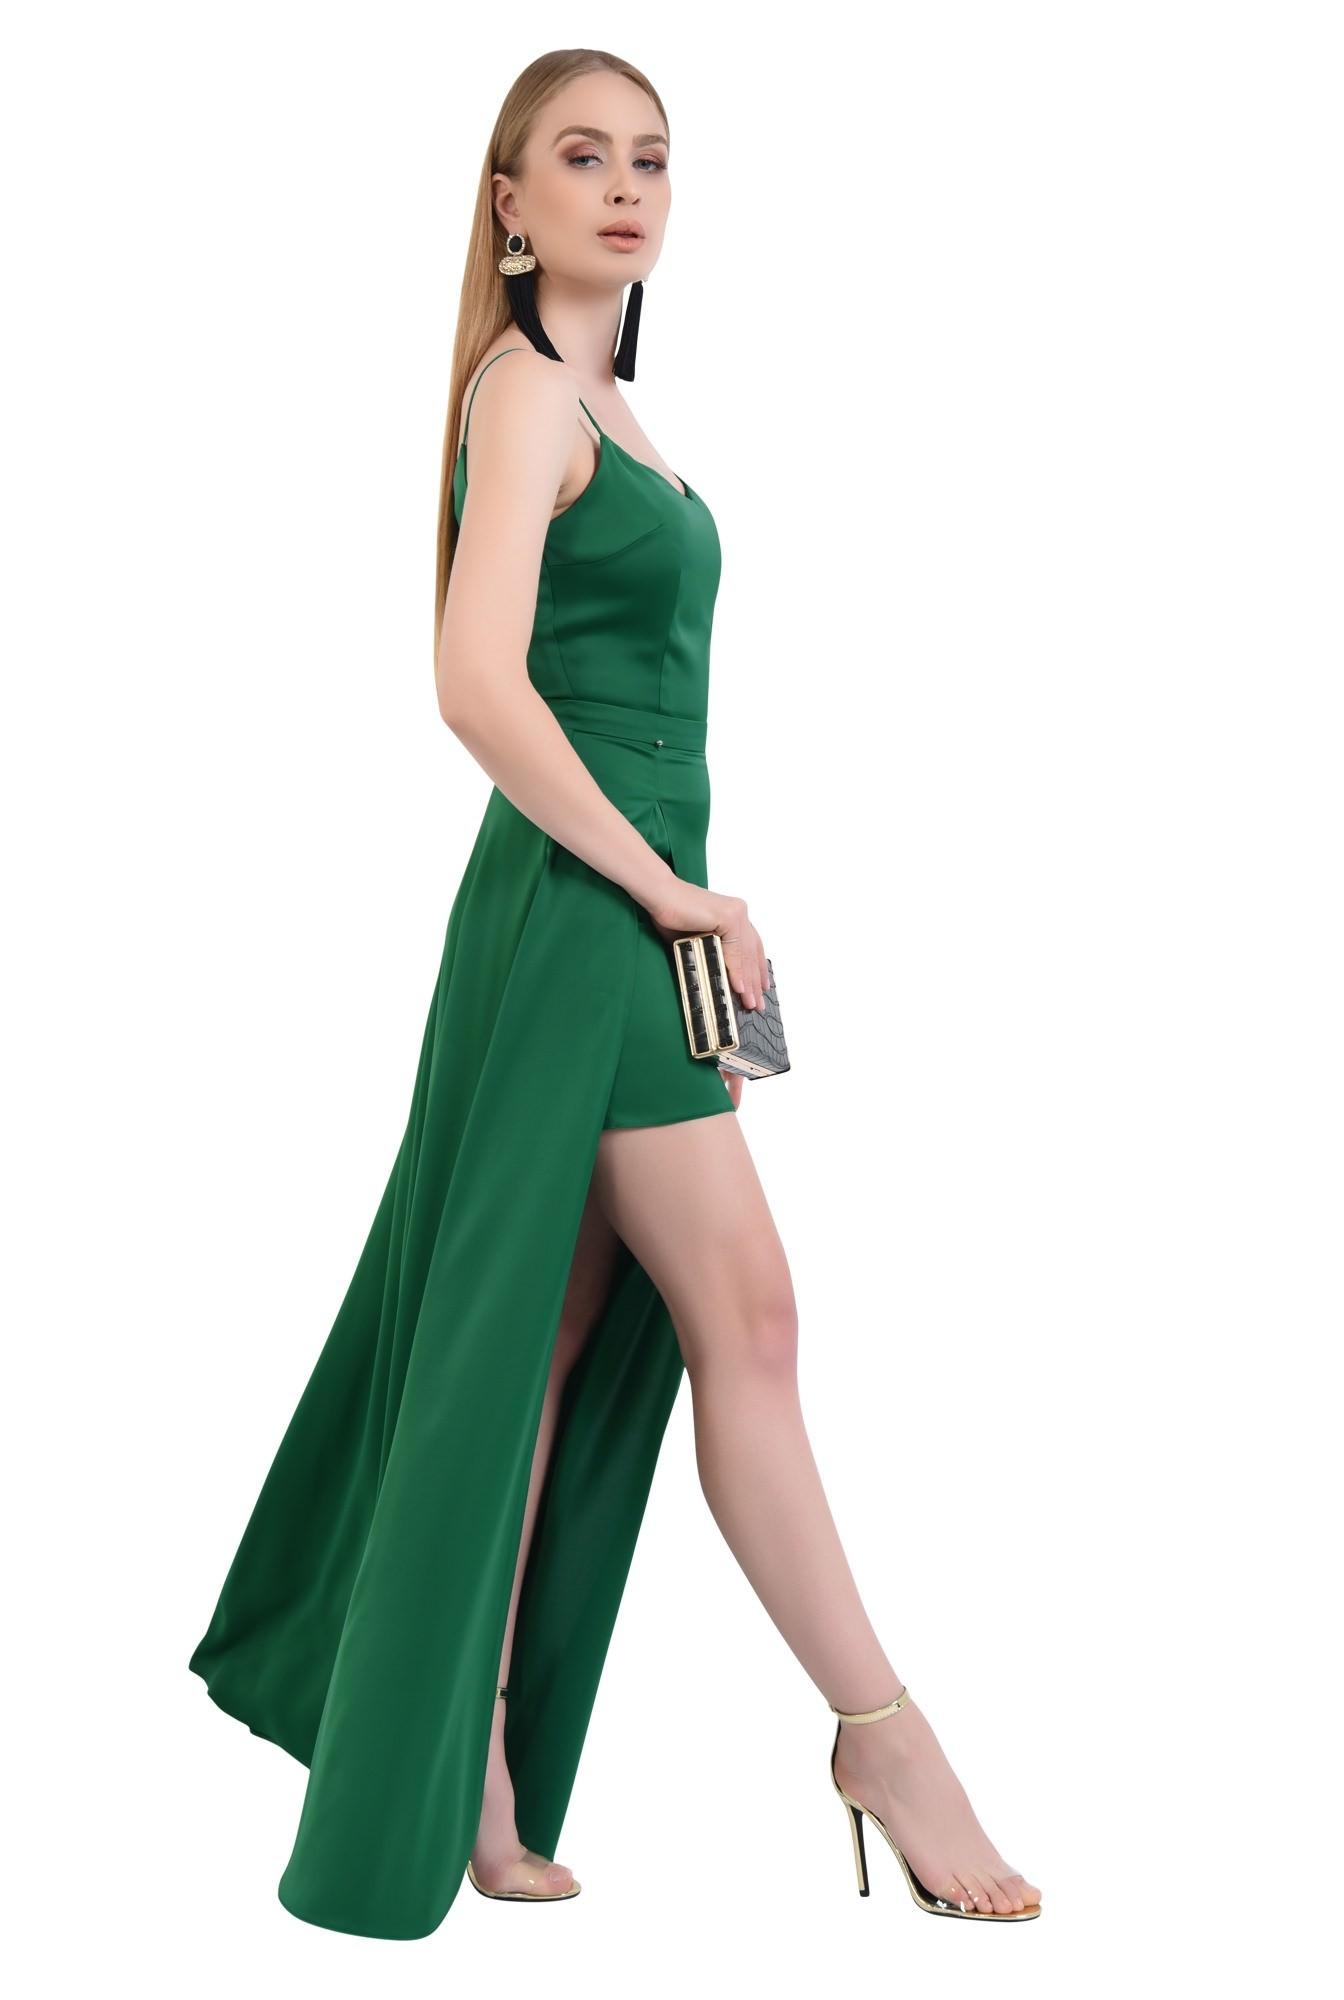 rochie de seara, slit adanc, verde, smarald, bretele subtiri